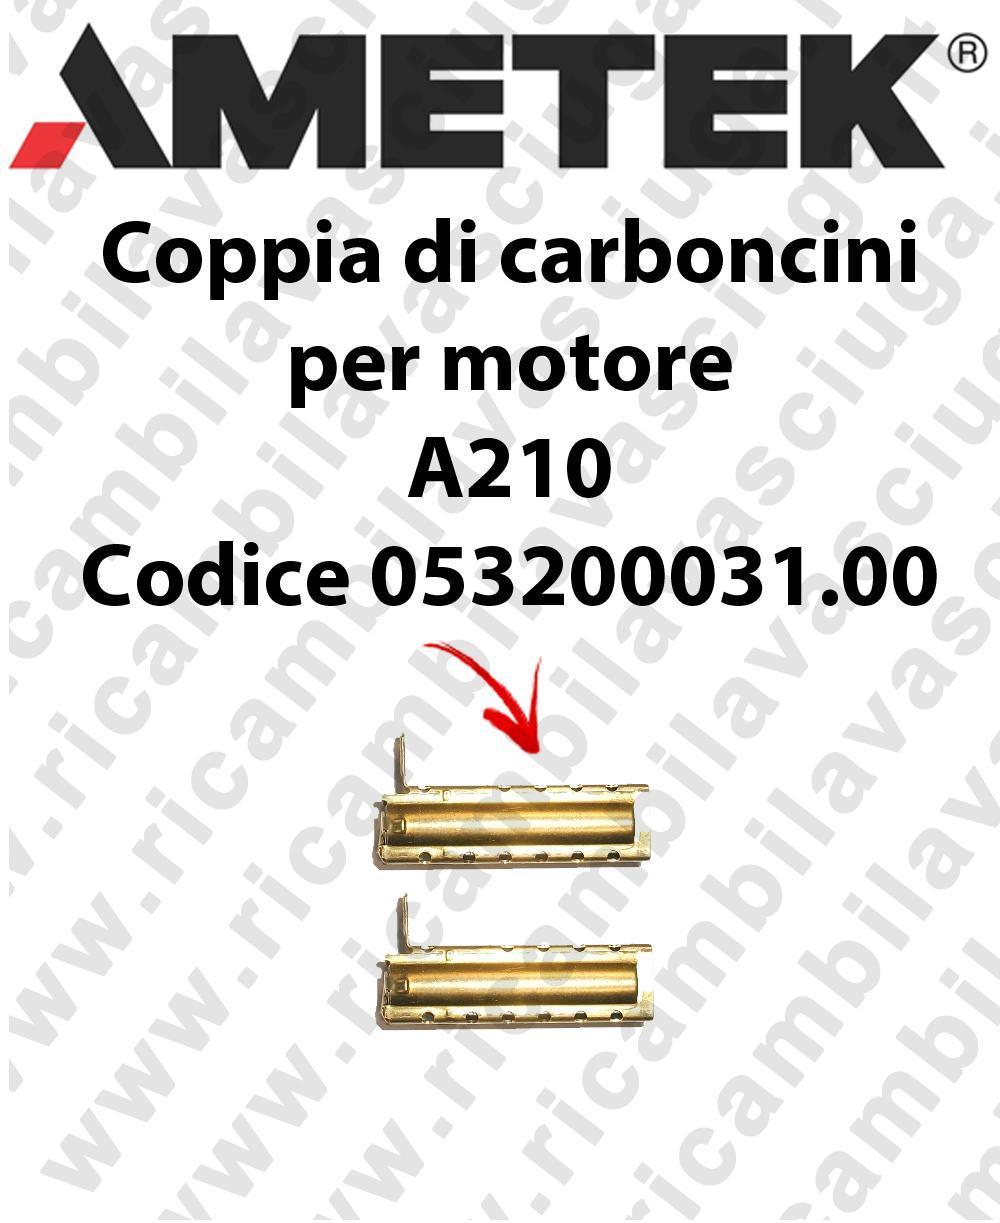 053200031.00 Paar Motorbürsten für motor AMETEK A210